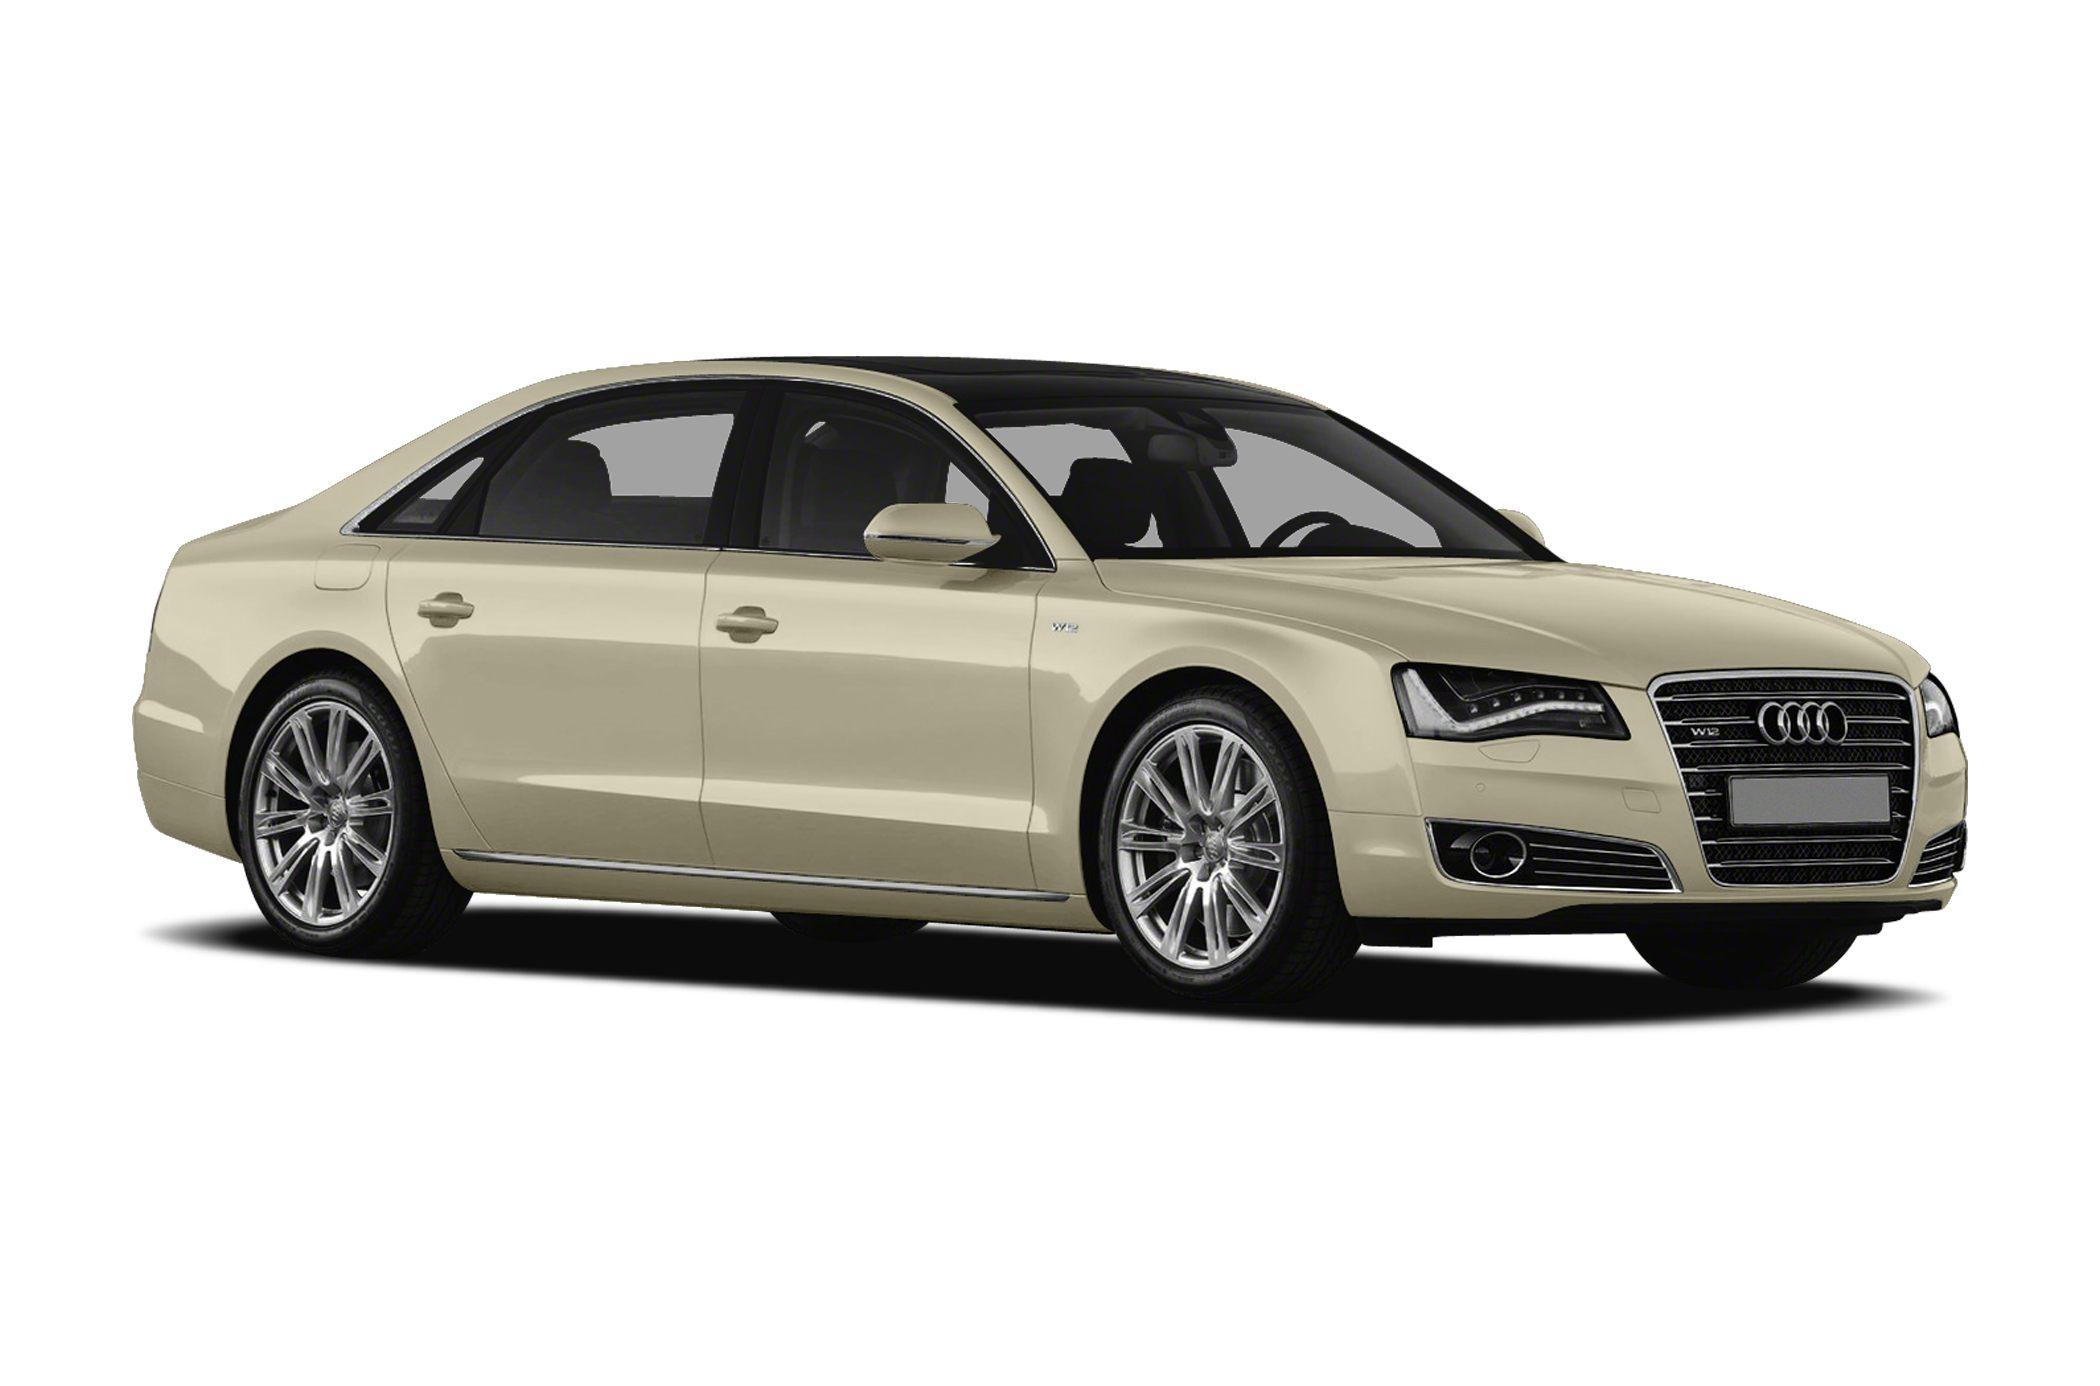 2013 Audi A8 L 4 0T 4dr All wheel Drive quattro LWB Sedan for Sale